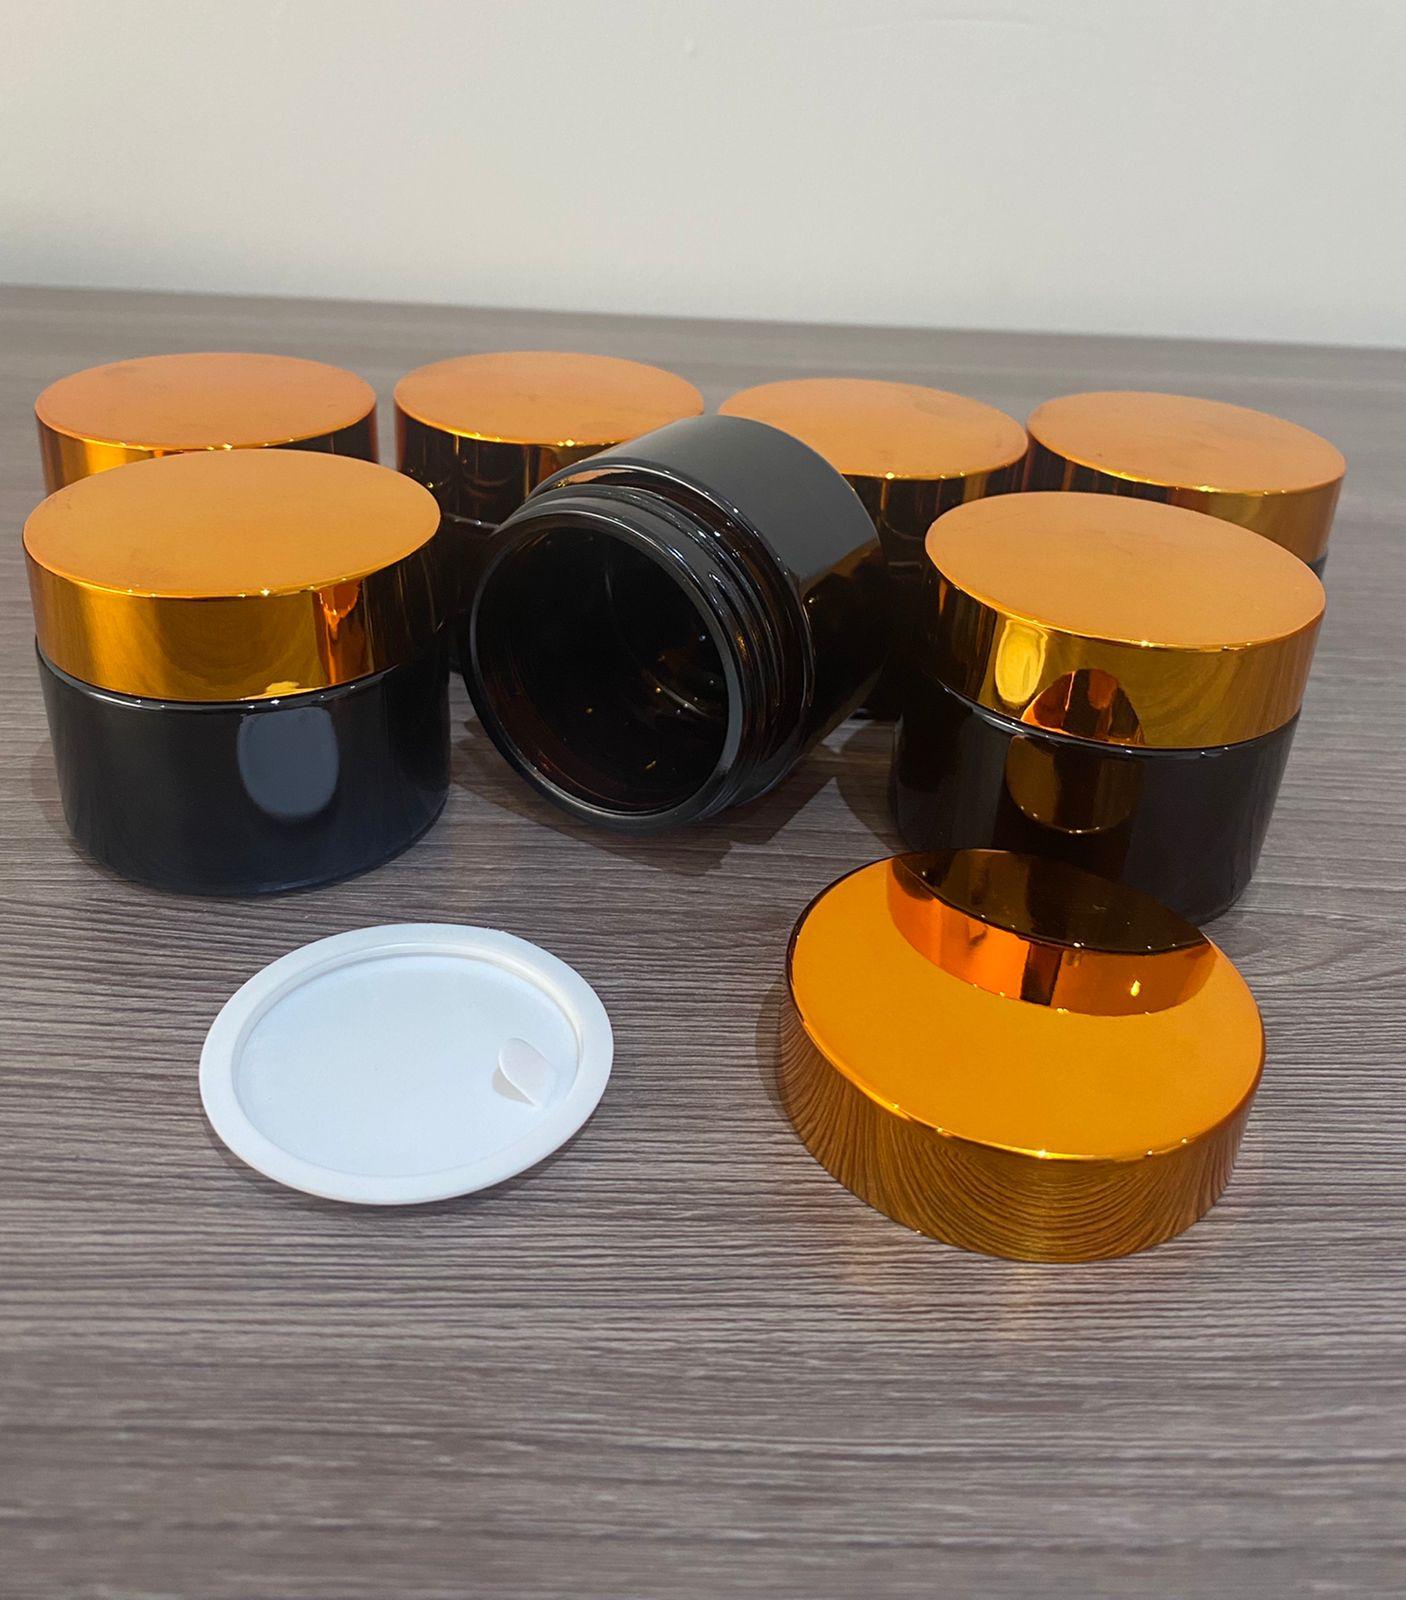 50 Potes vidro âmbar 50ml